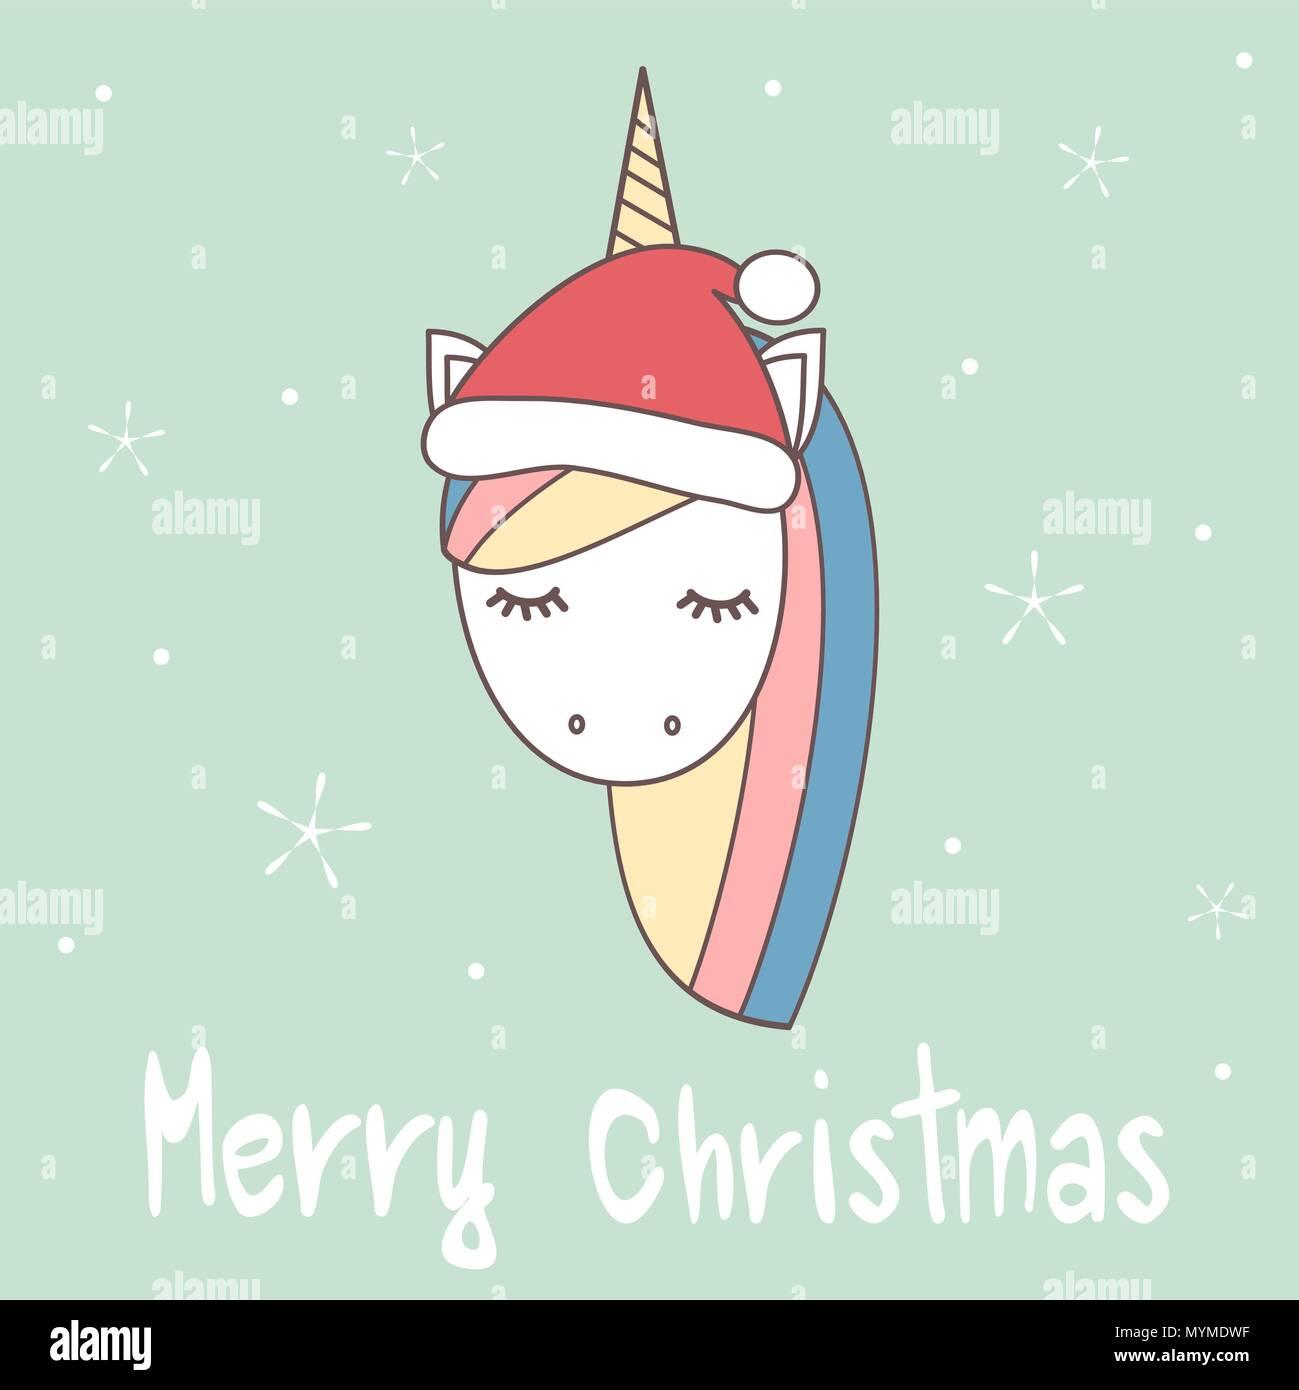 Cute Cartoon Hand Drawn Merry Christmas Vector Greeting Card With